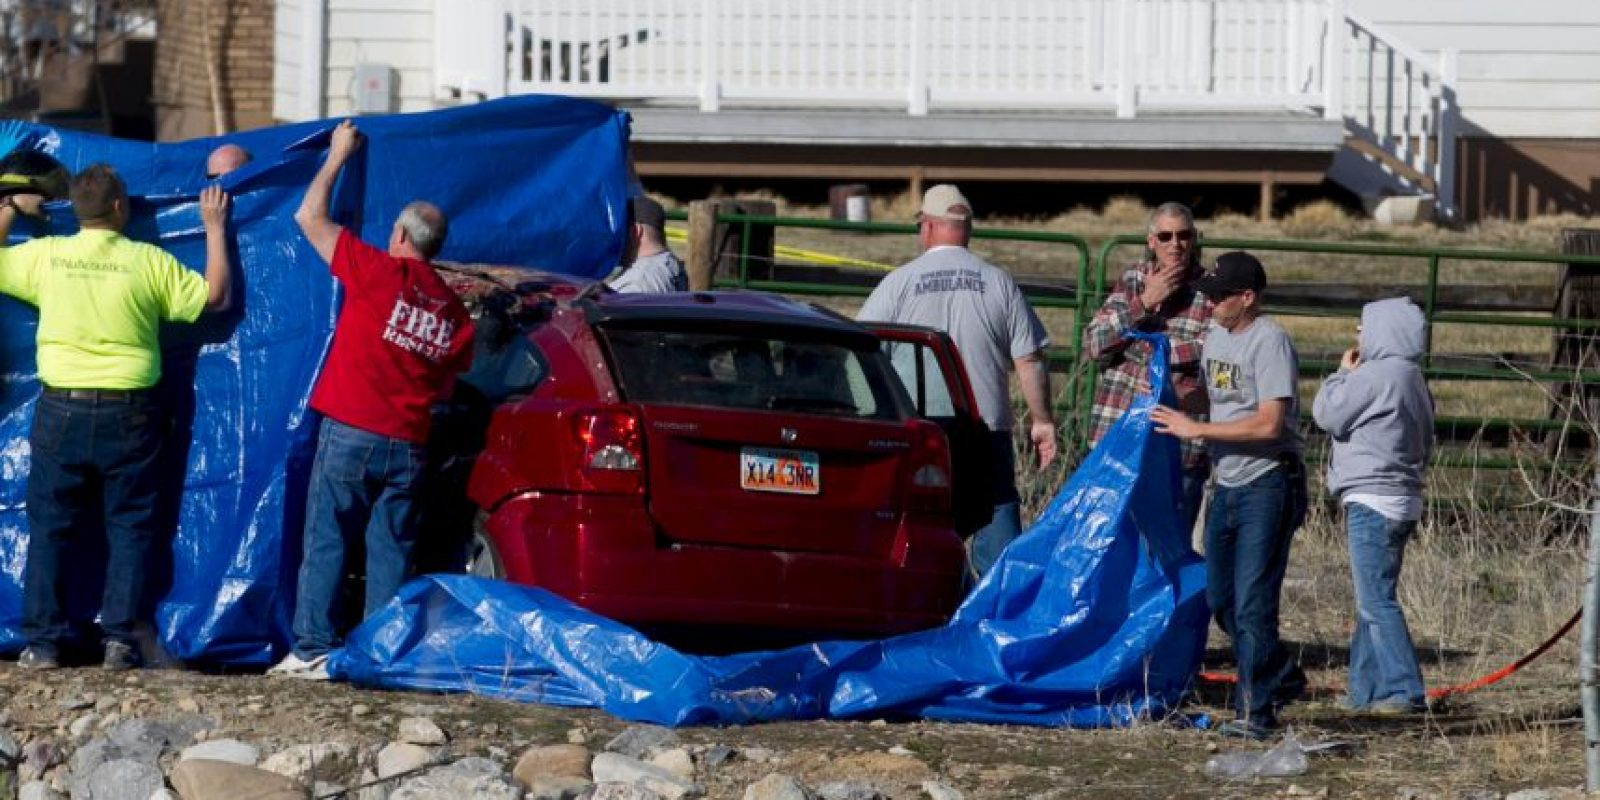 Autoridades aseguran haber escuchado a una mujer pedir auxilio Foto:AP